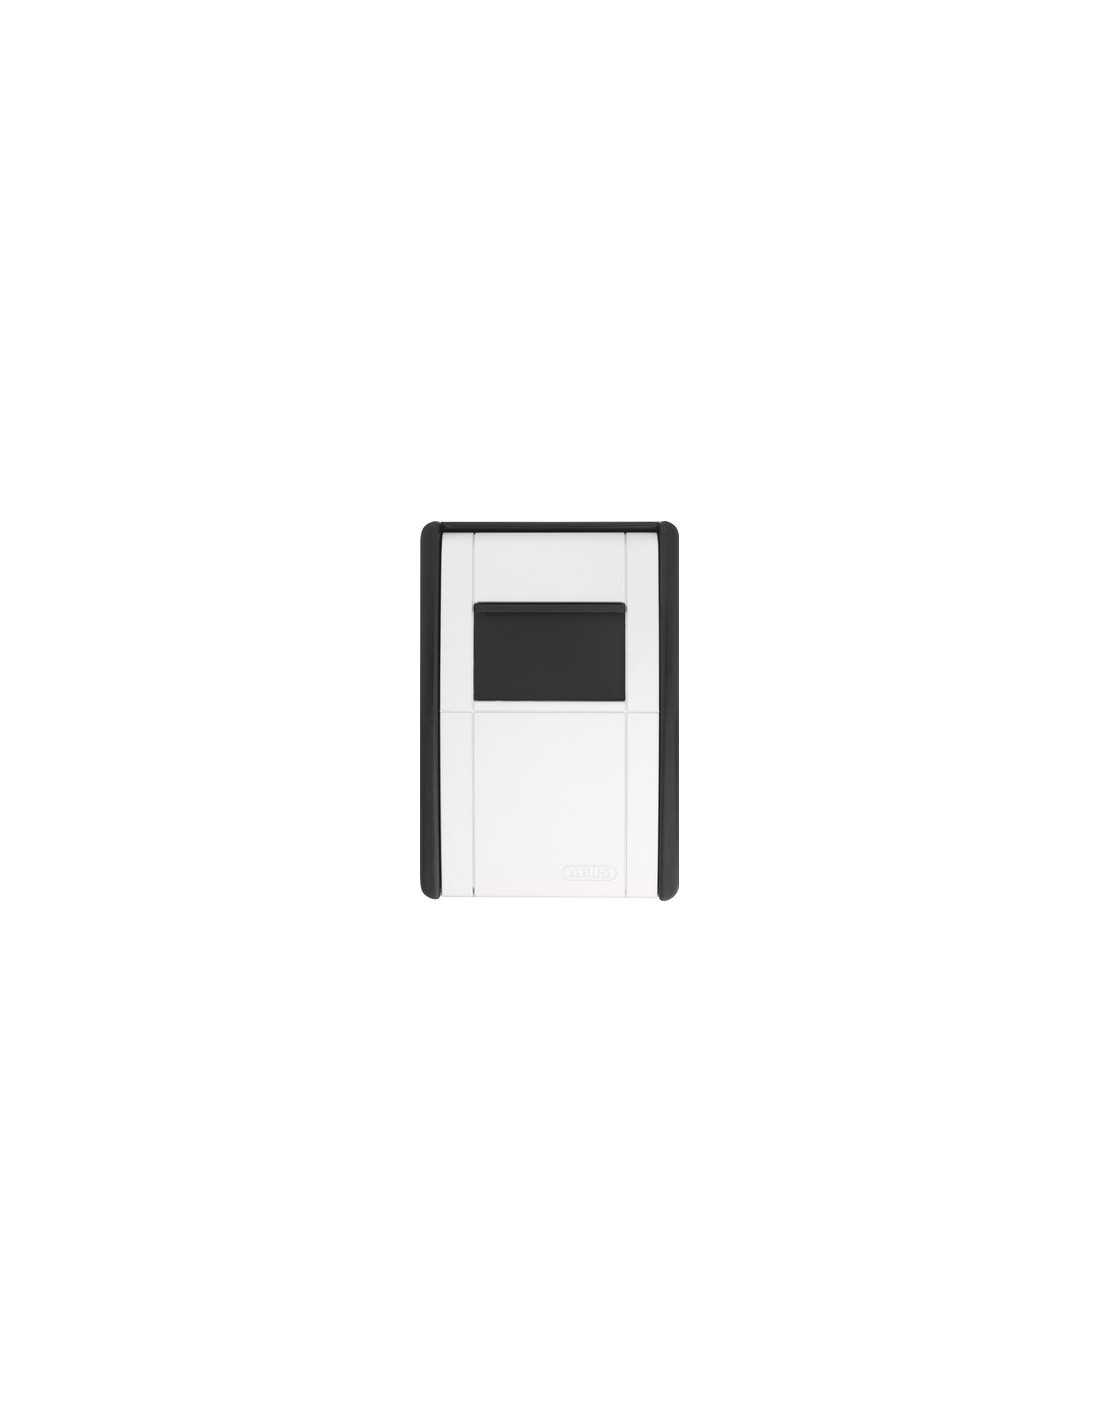 abus keygarage 787 b zur wandmontage 46331. Black Bedroom Furniture Sets. Home Design Ideas